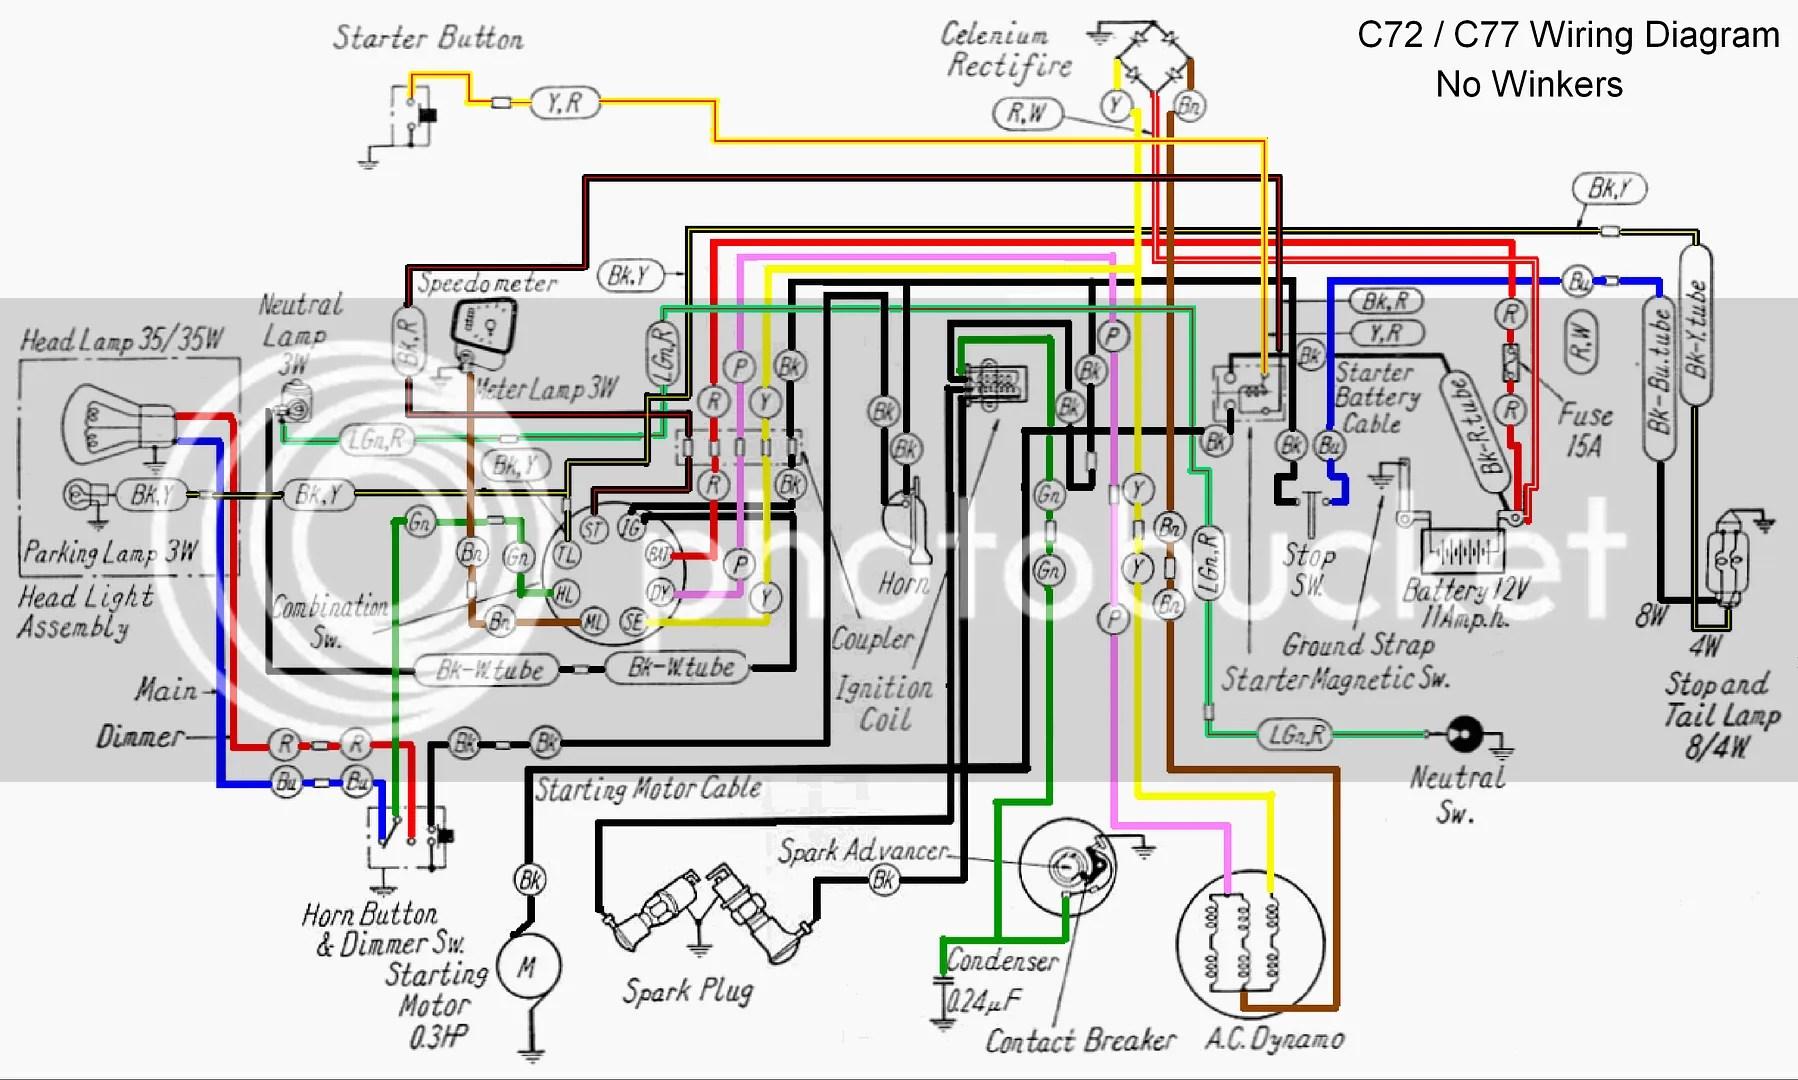 hight resolution of honda cl70 wiring diagram wiring diagram todays honda z50 wiring diagram honda cl70 wiring diagram wiring